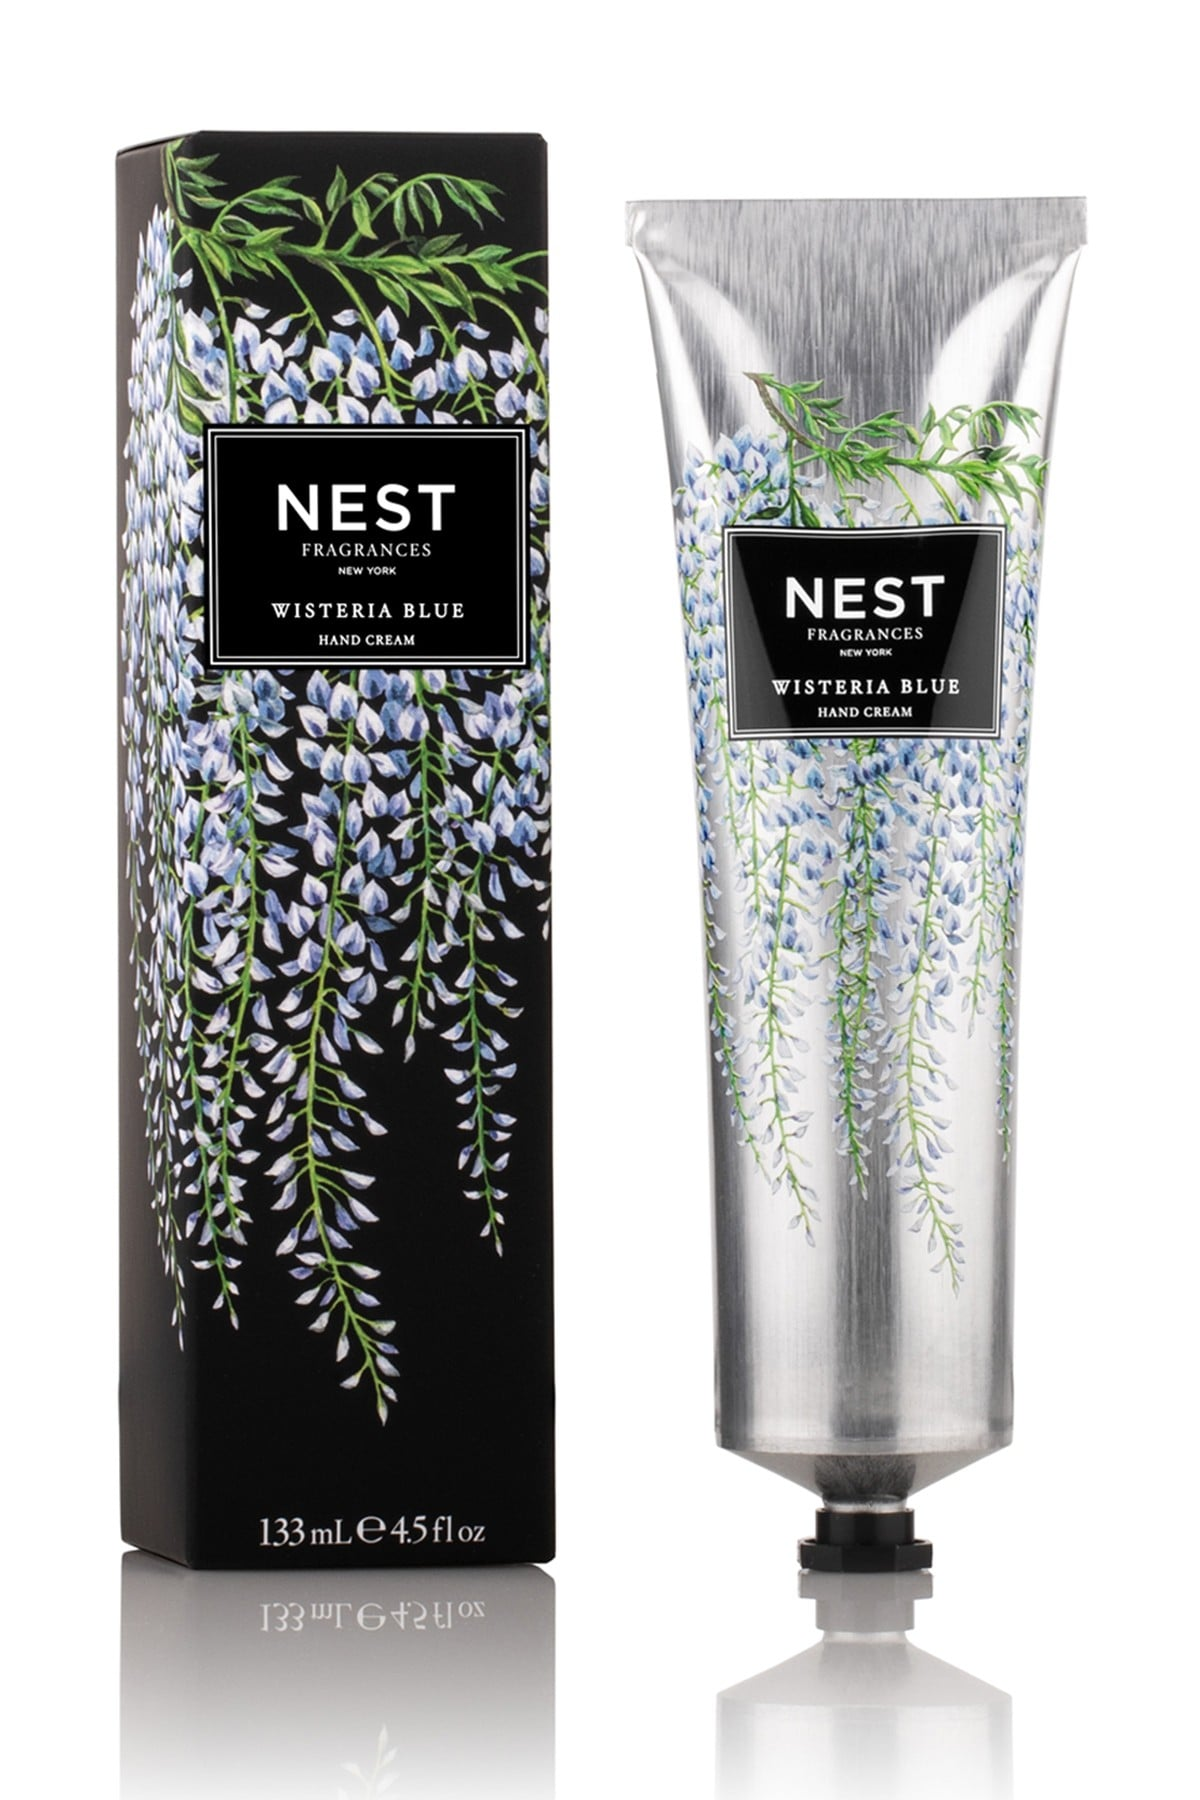 Nest Fragrances Hand Cream in Wisteria